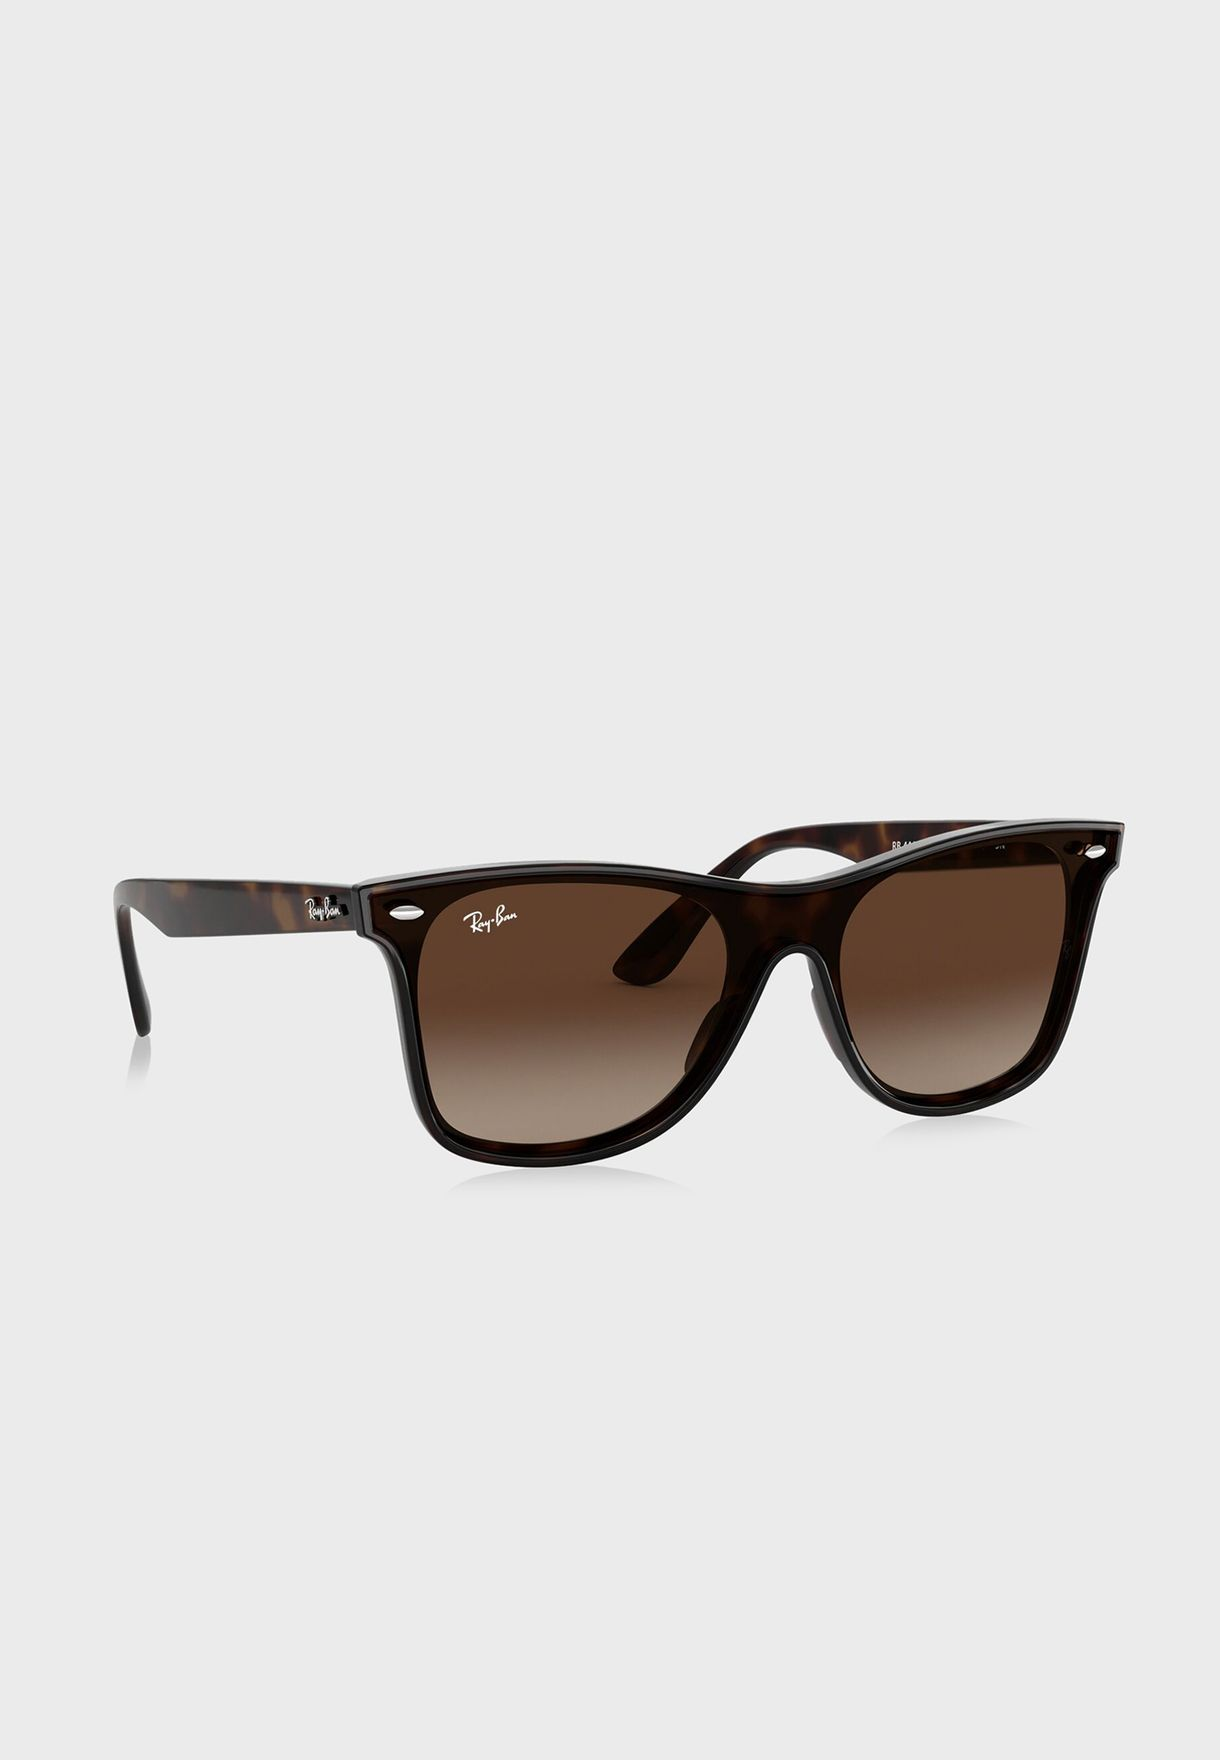 a35ac4f9c9 Shop Ray-Ban browns 0RB4440N Blaze wayfarer sunglasses 8053672919066 ...